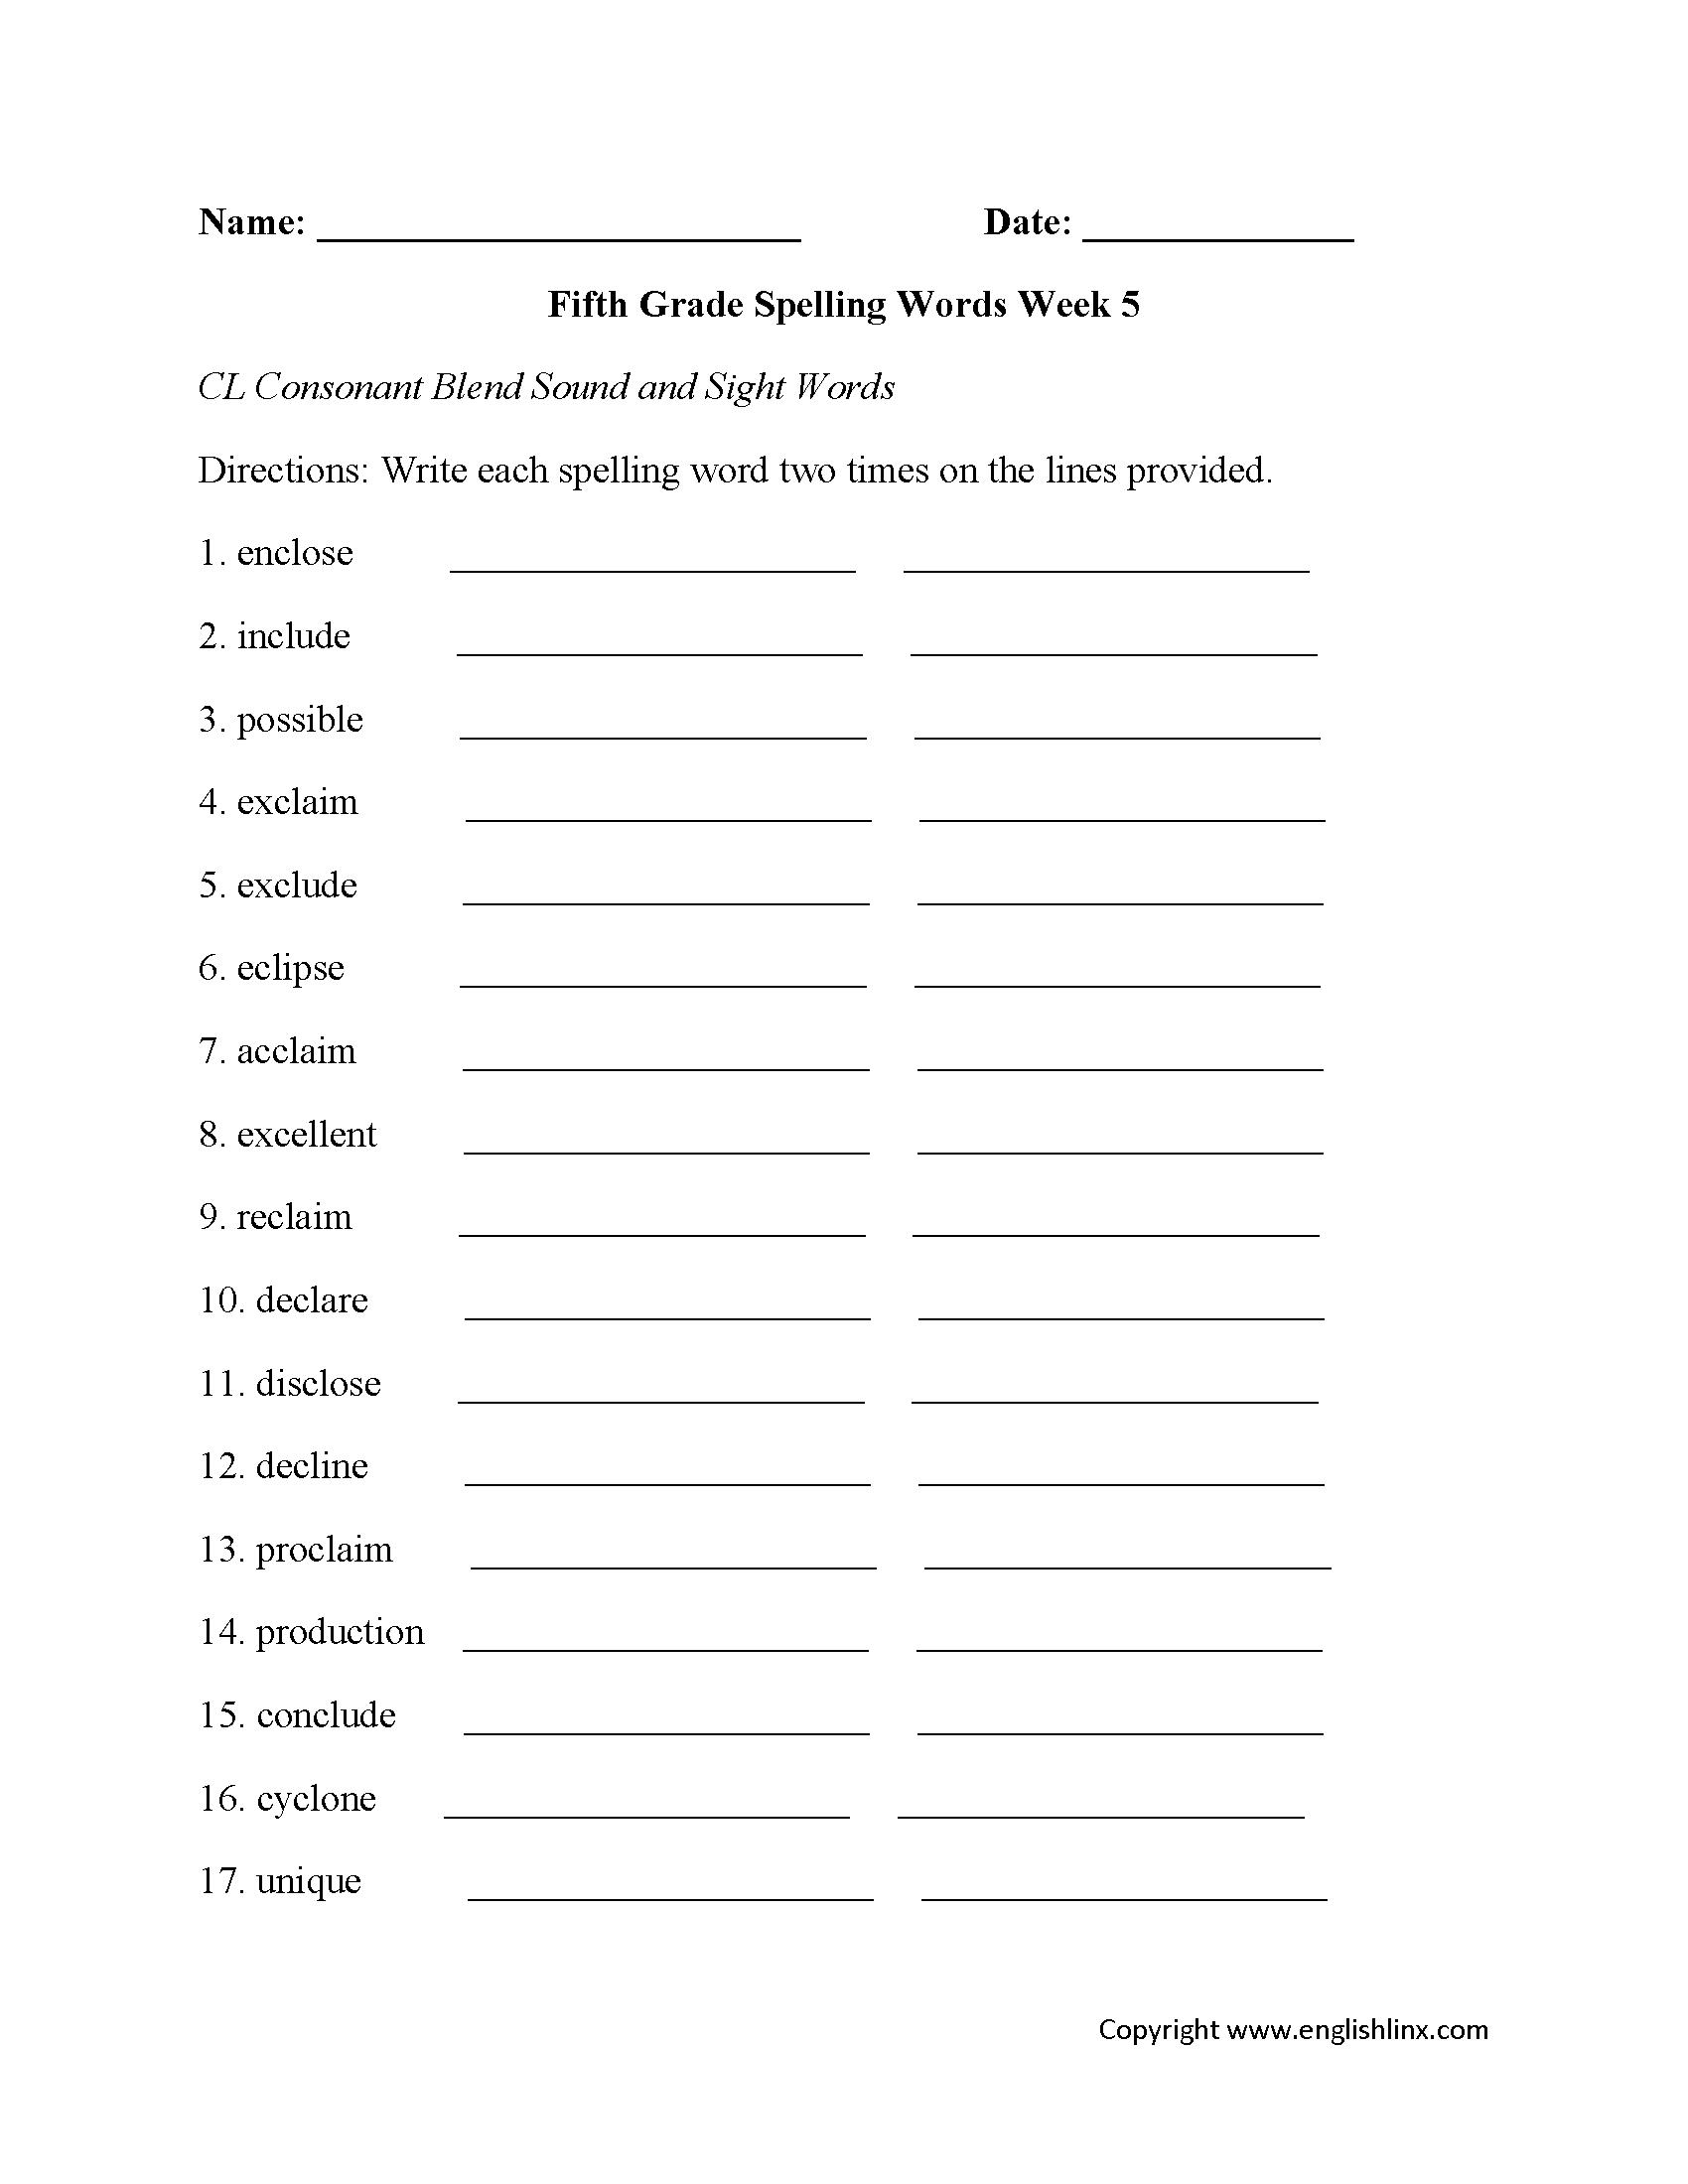 worksheet Make Your Own Spelling Worksheets week 5 cl consonant fifth grade spelling worksheets lessons worksheets